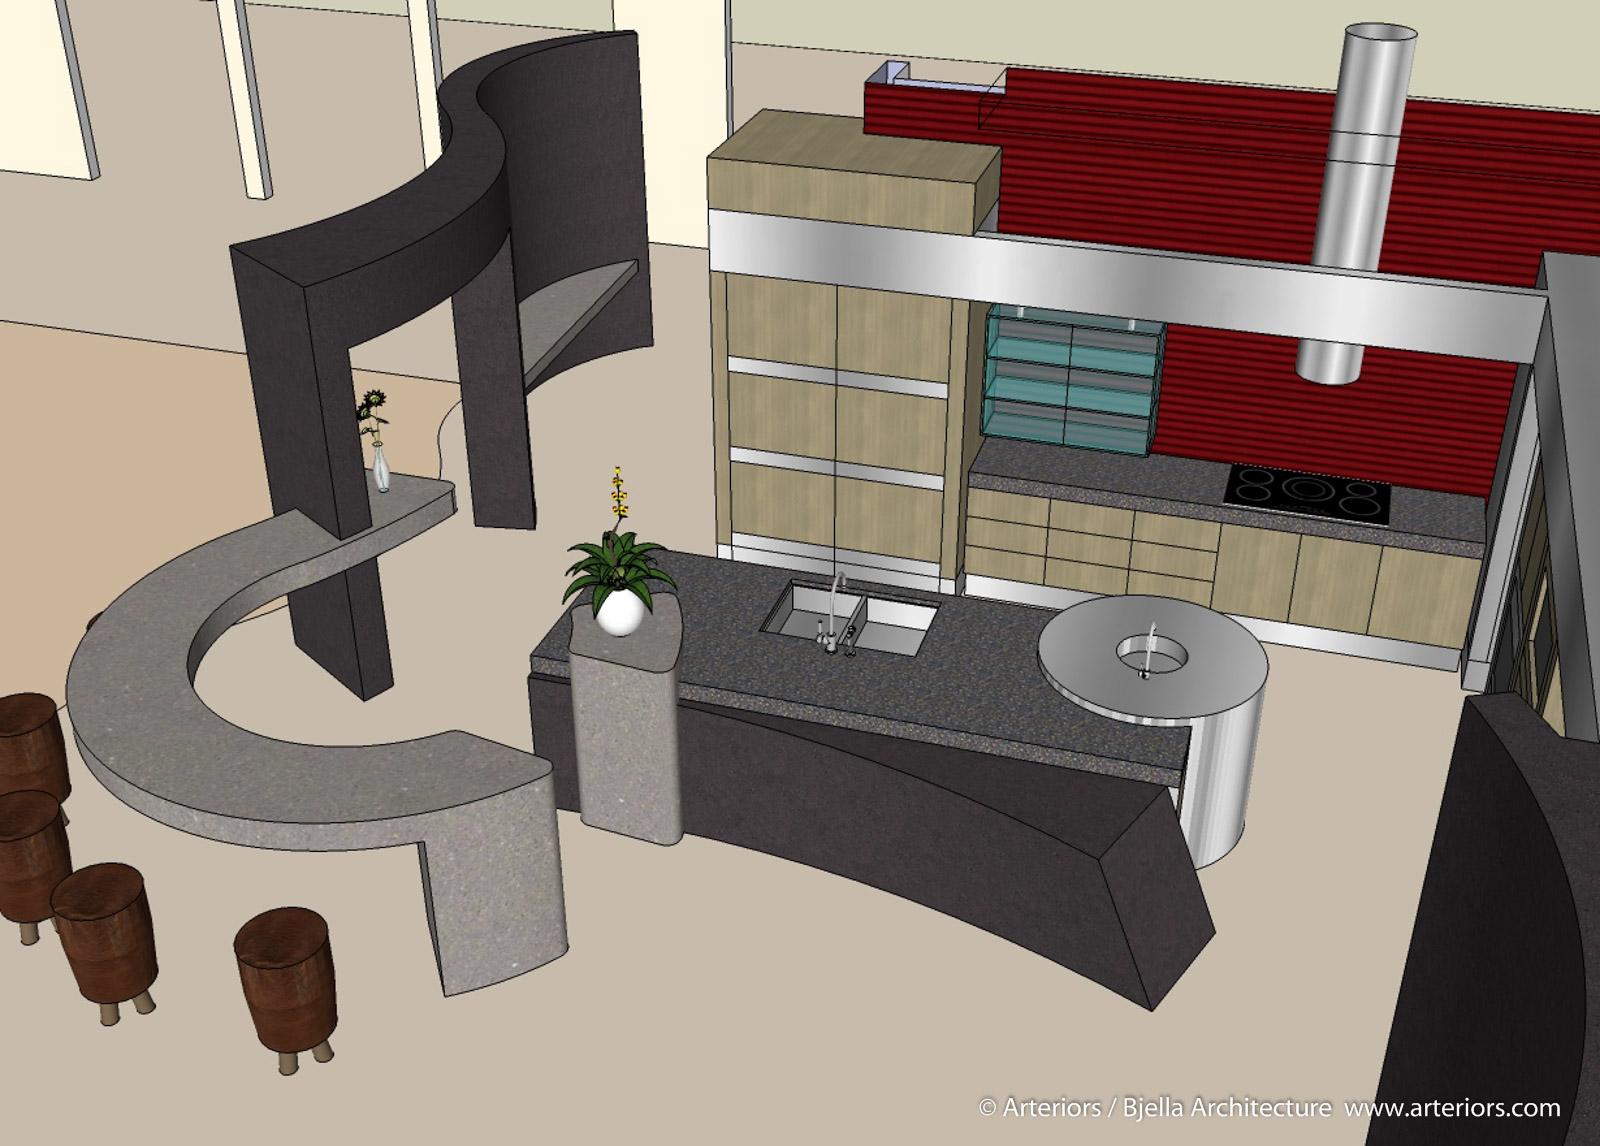 3D Architectural Modeling - Modern Kitchen